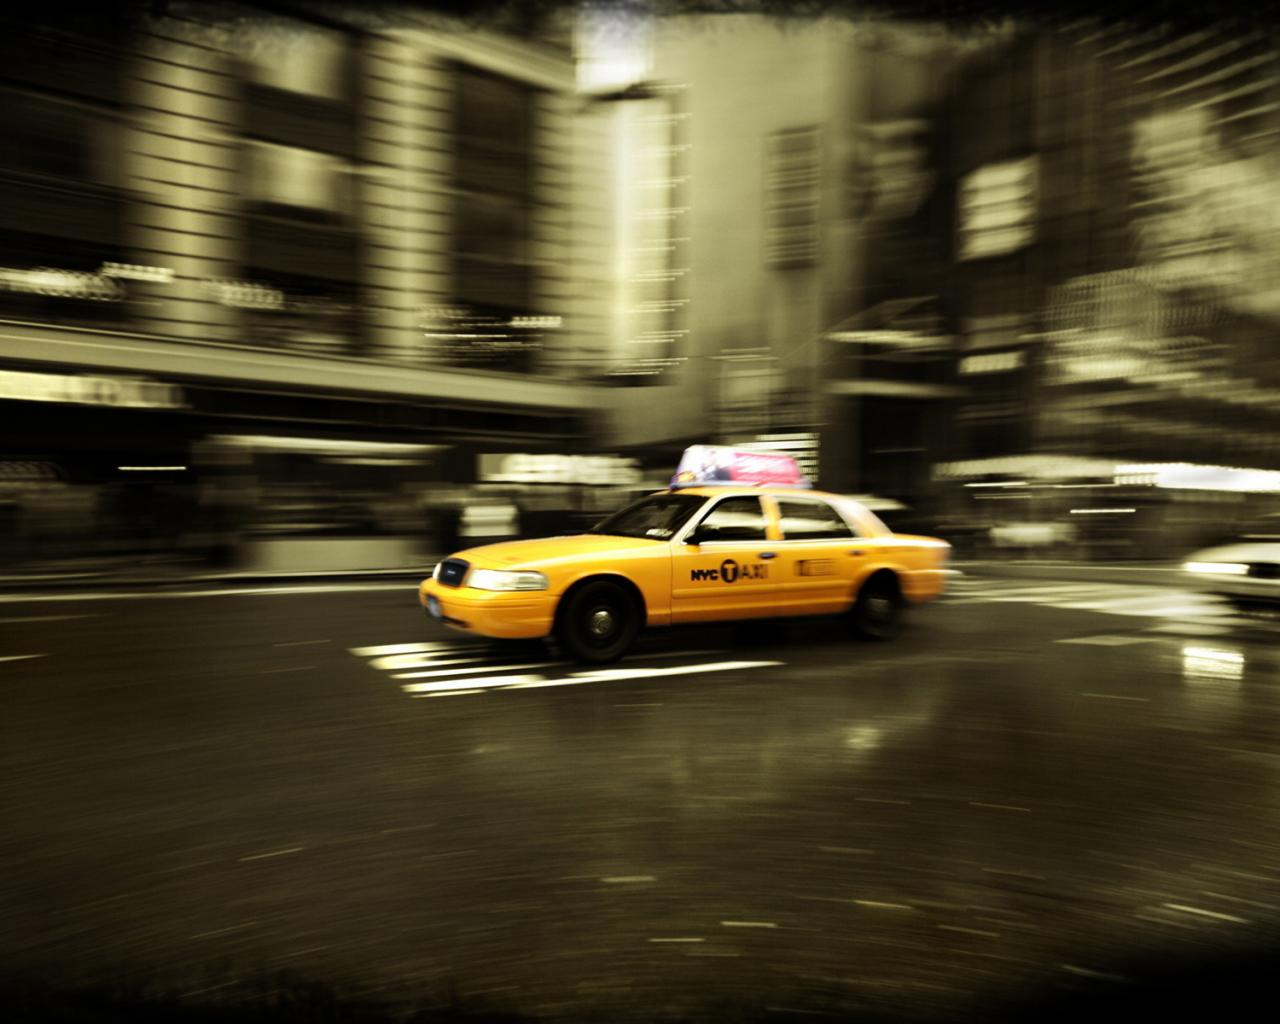 фотообои нью йорк такси: